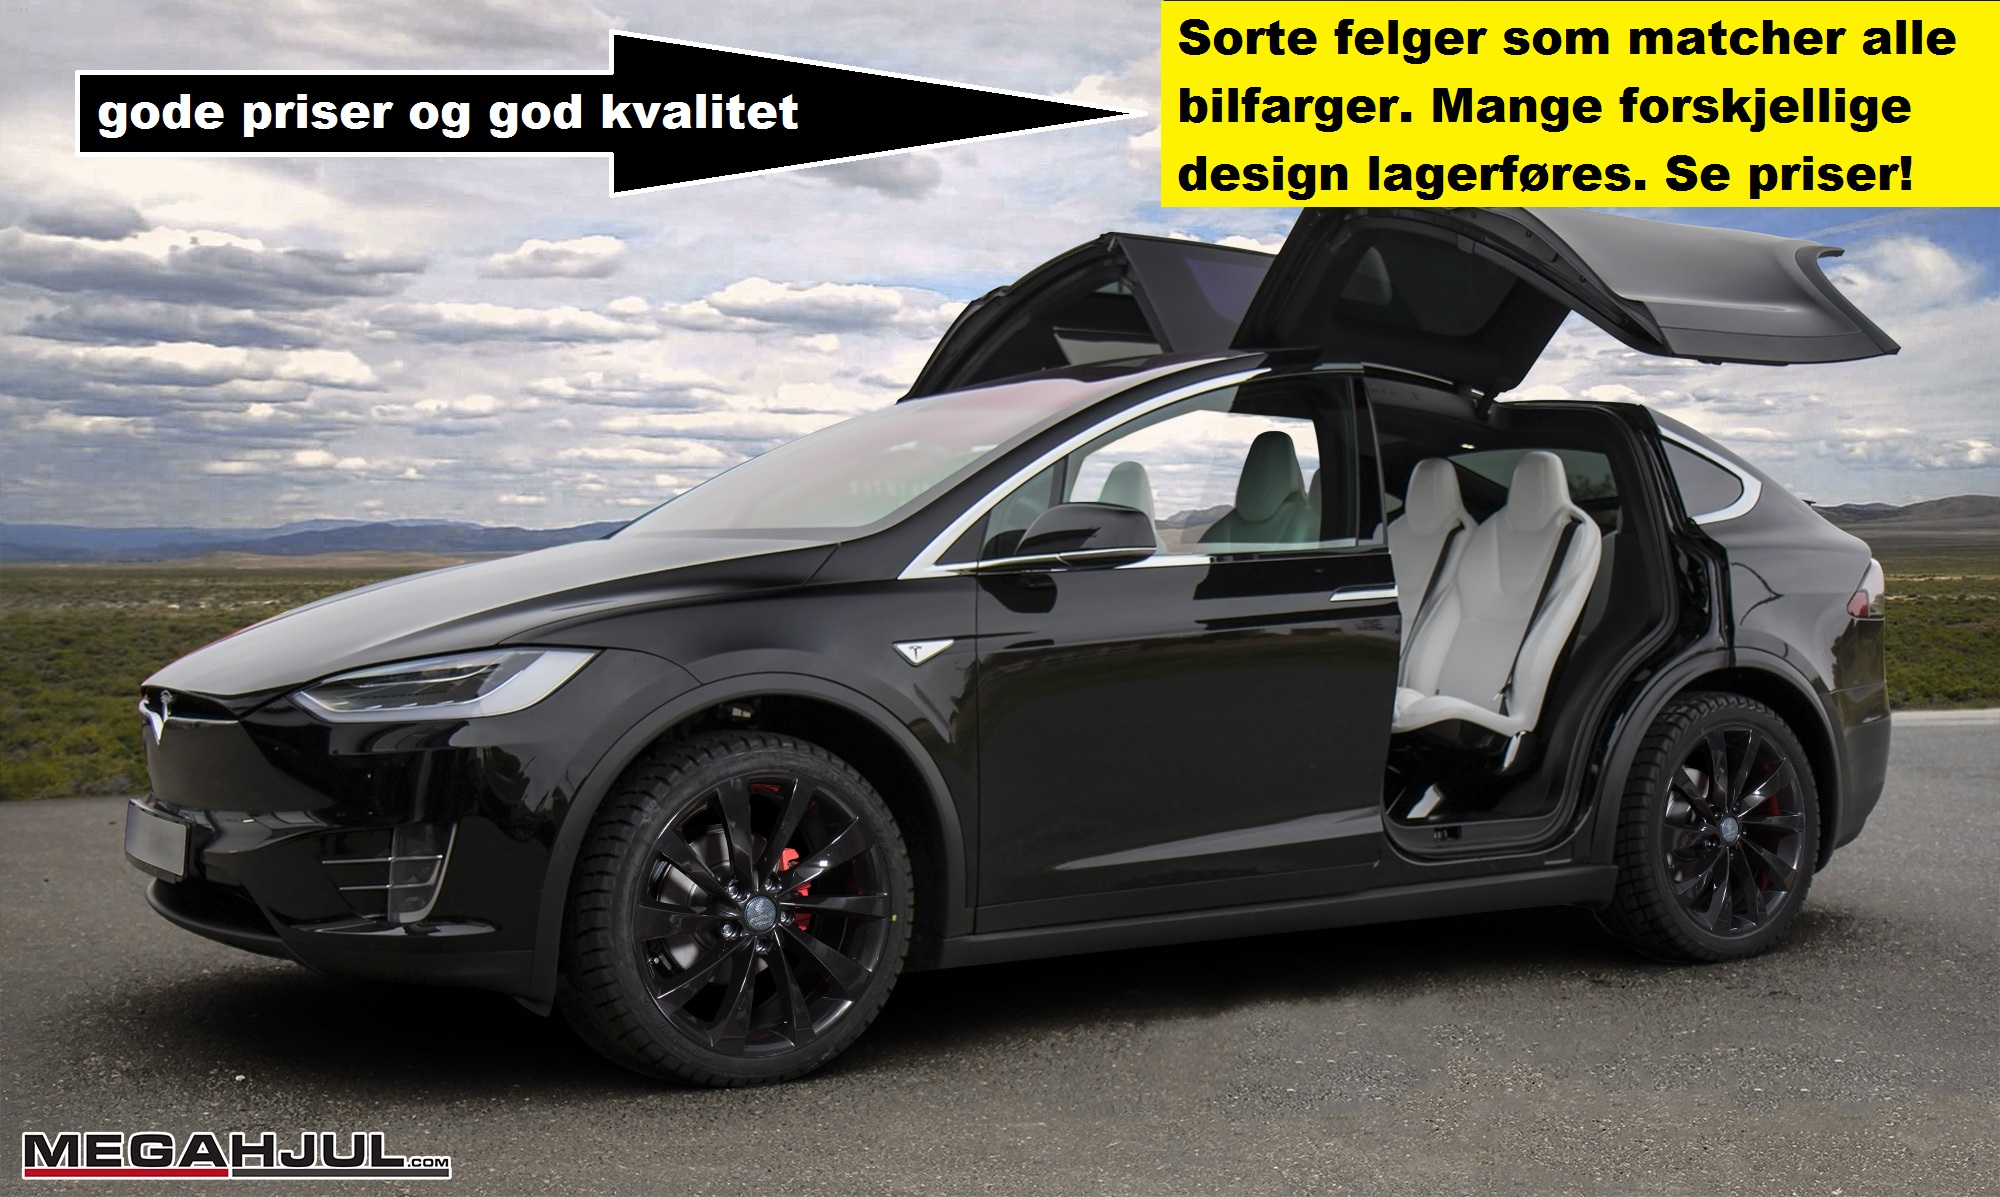 Vinterhjul anbefalt til Tesla Model X